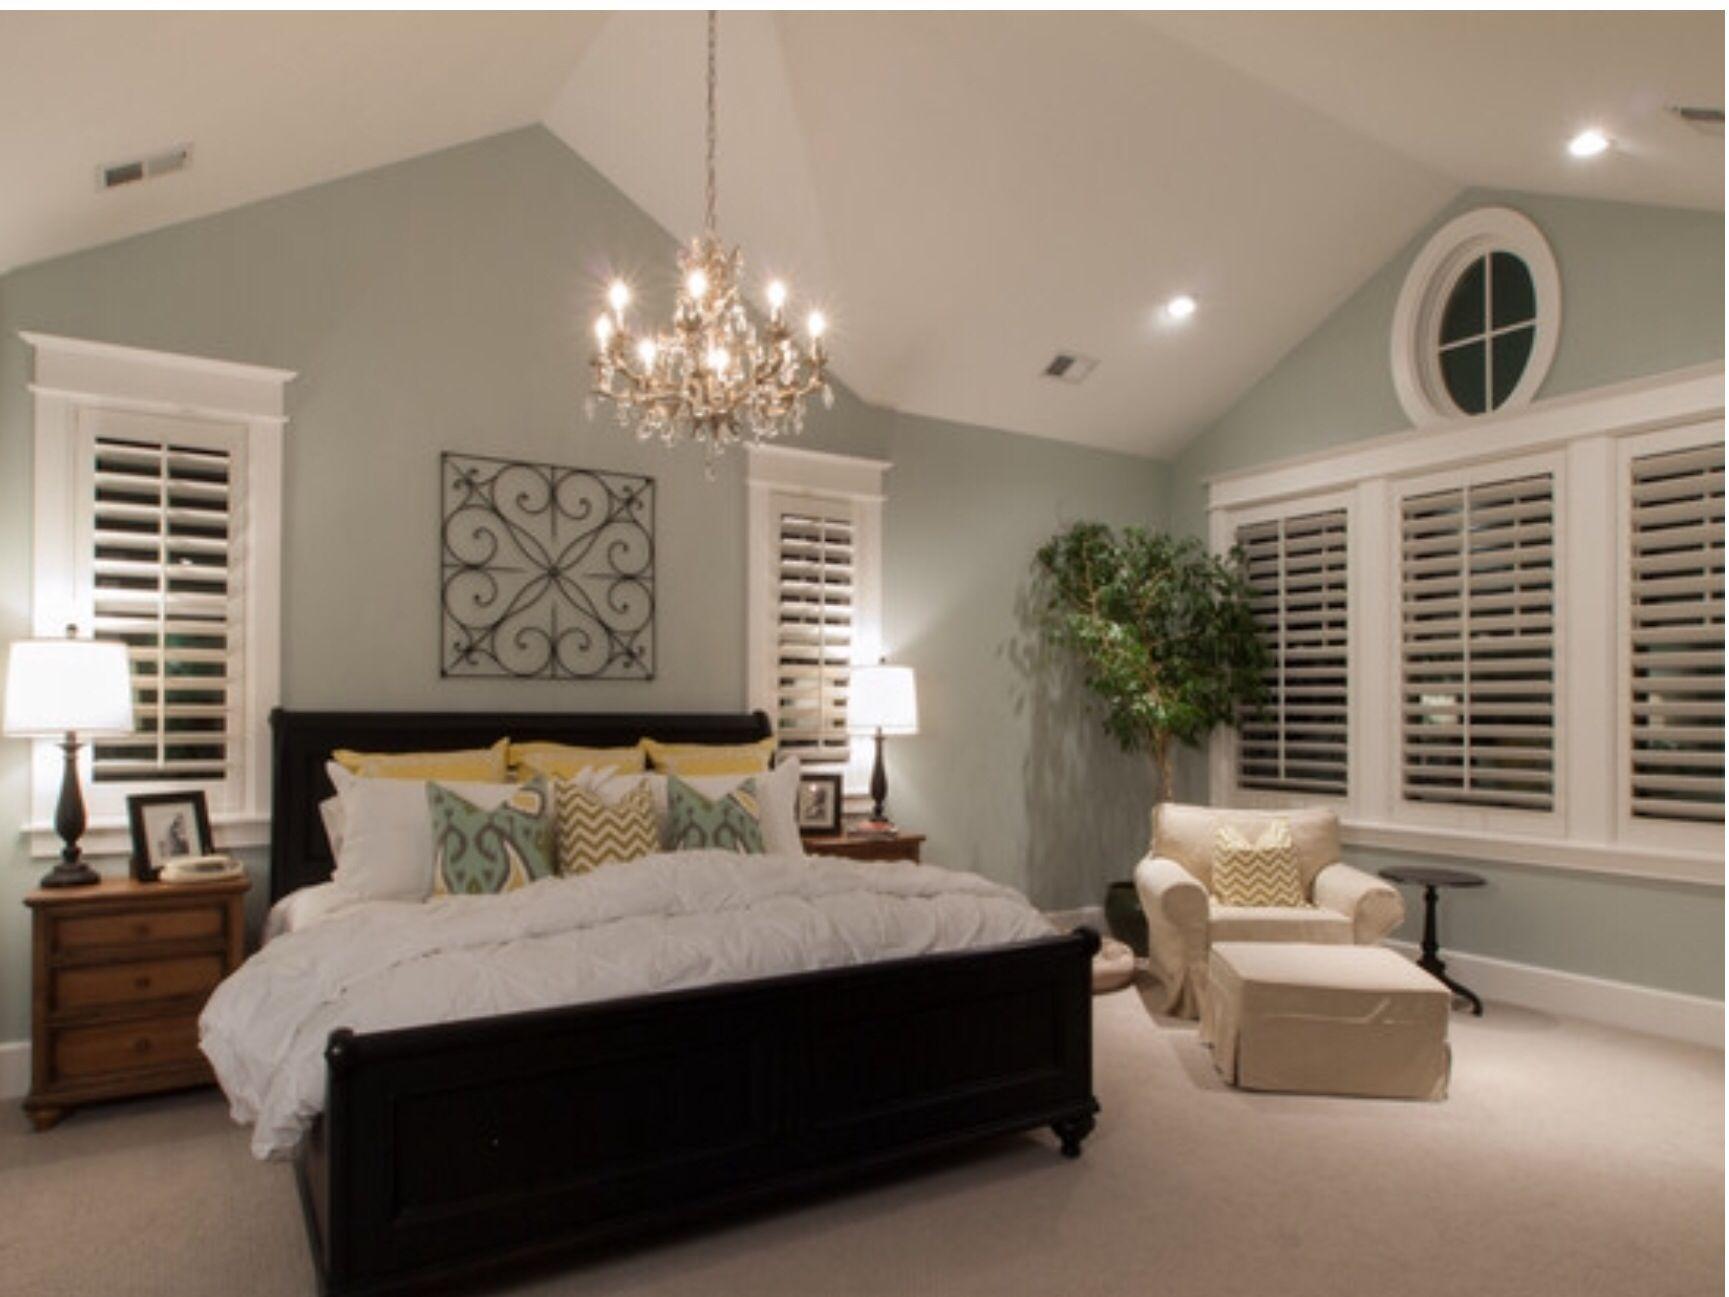 Simple Elegance Bedroom Retreatdream Bedroombedroom Beachpretty Bedroomplantation Shutterplantation Decorbedroom Designsbedroom